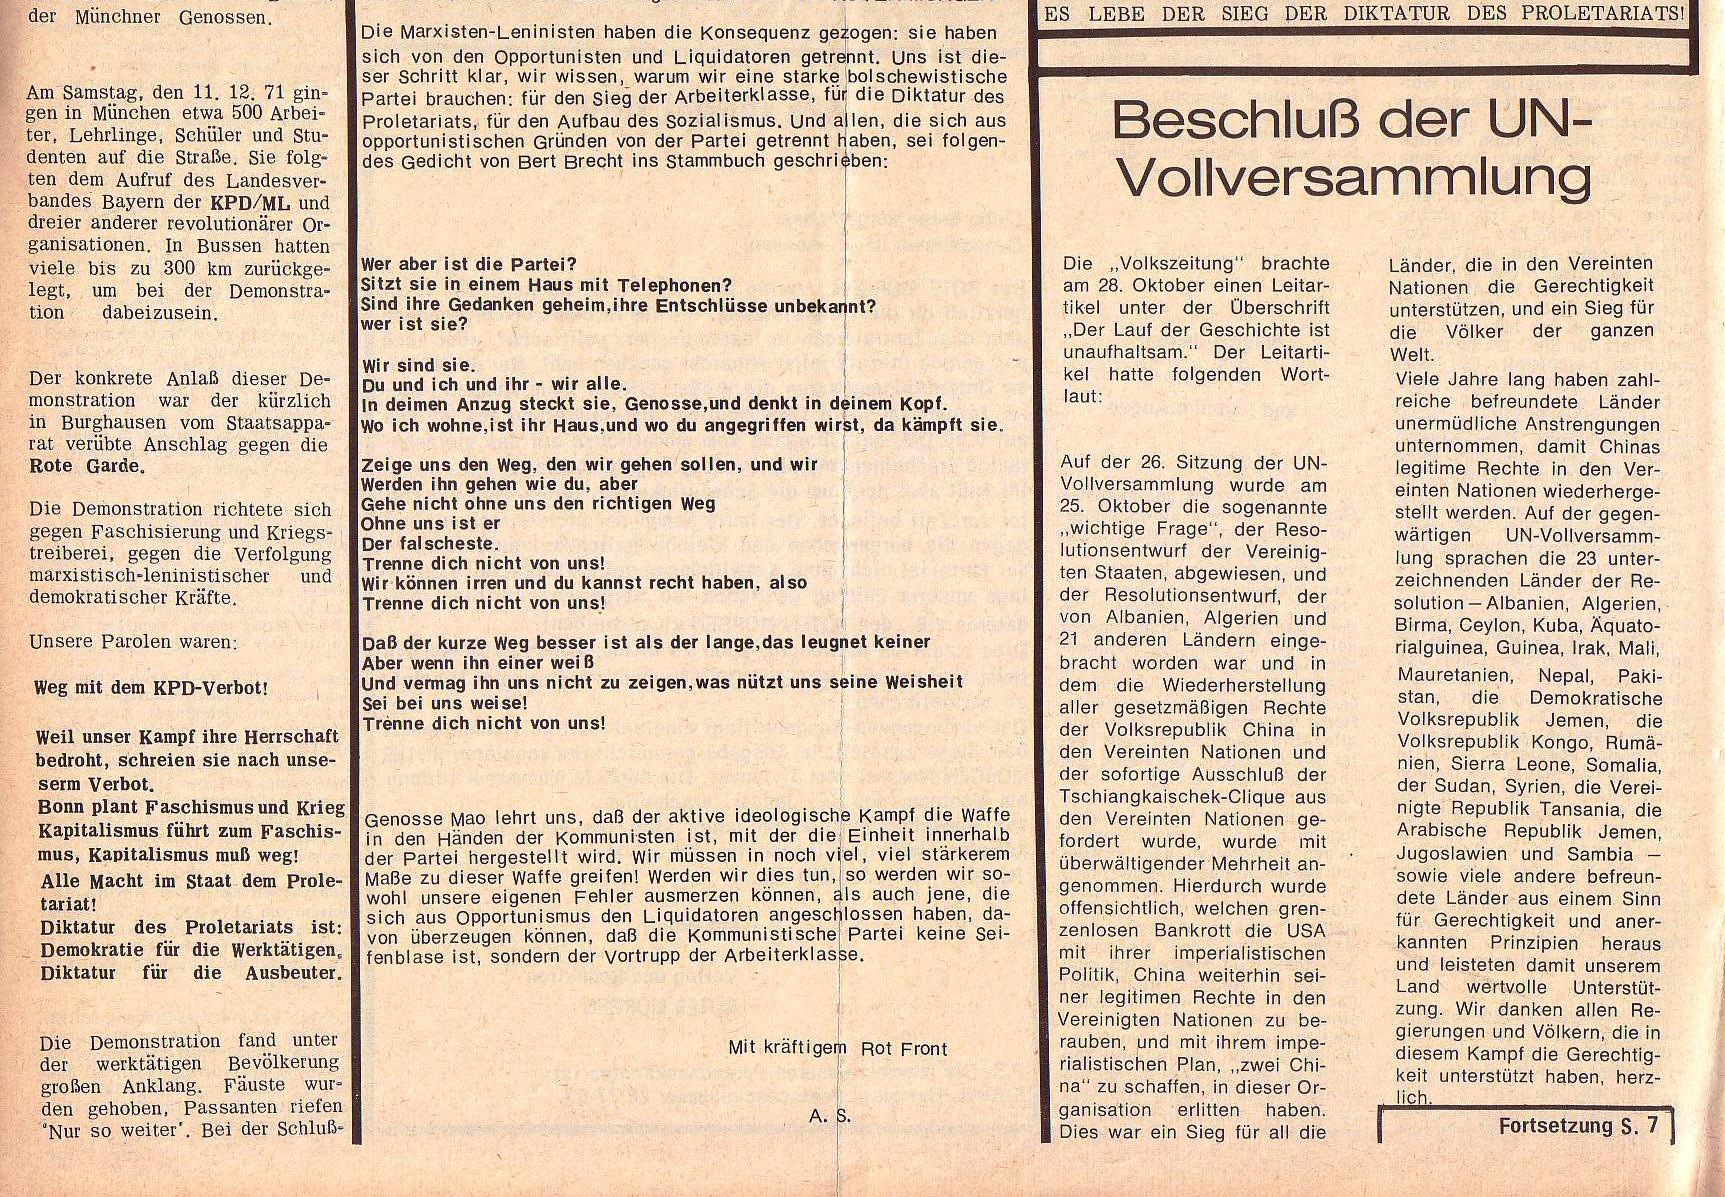 Roter Morgen, 5. Jg., 27. Dezember 1971, Nr. 16, Seite 6b